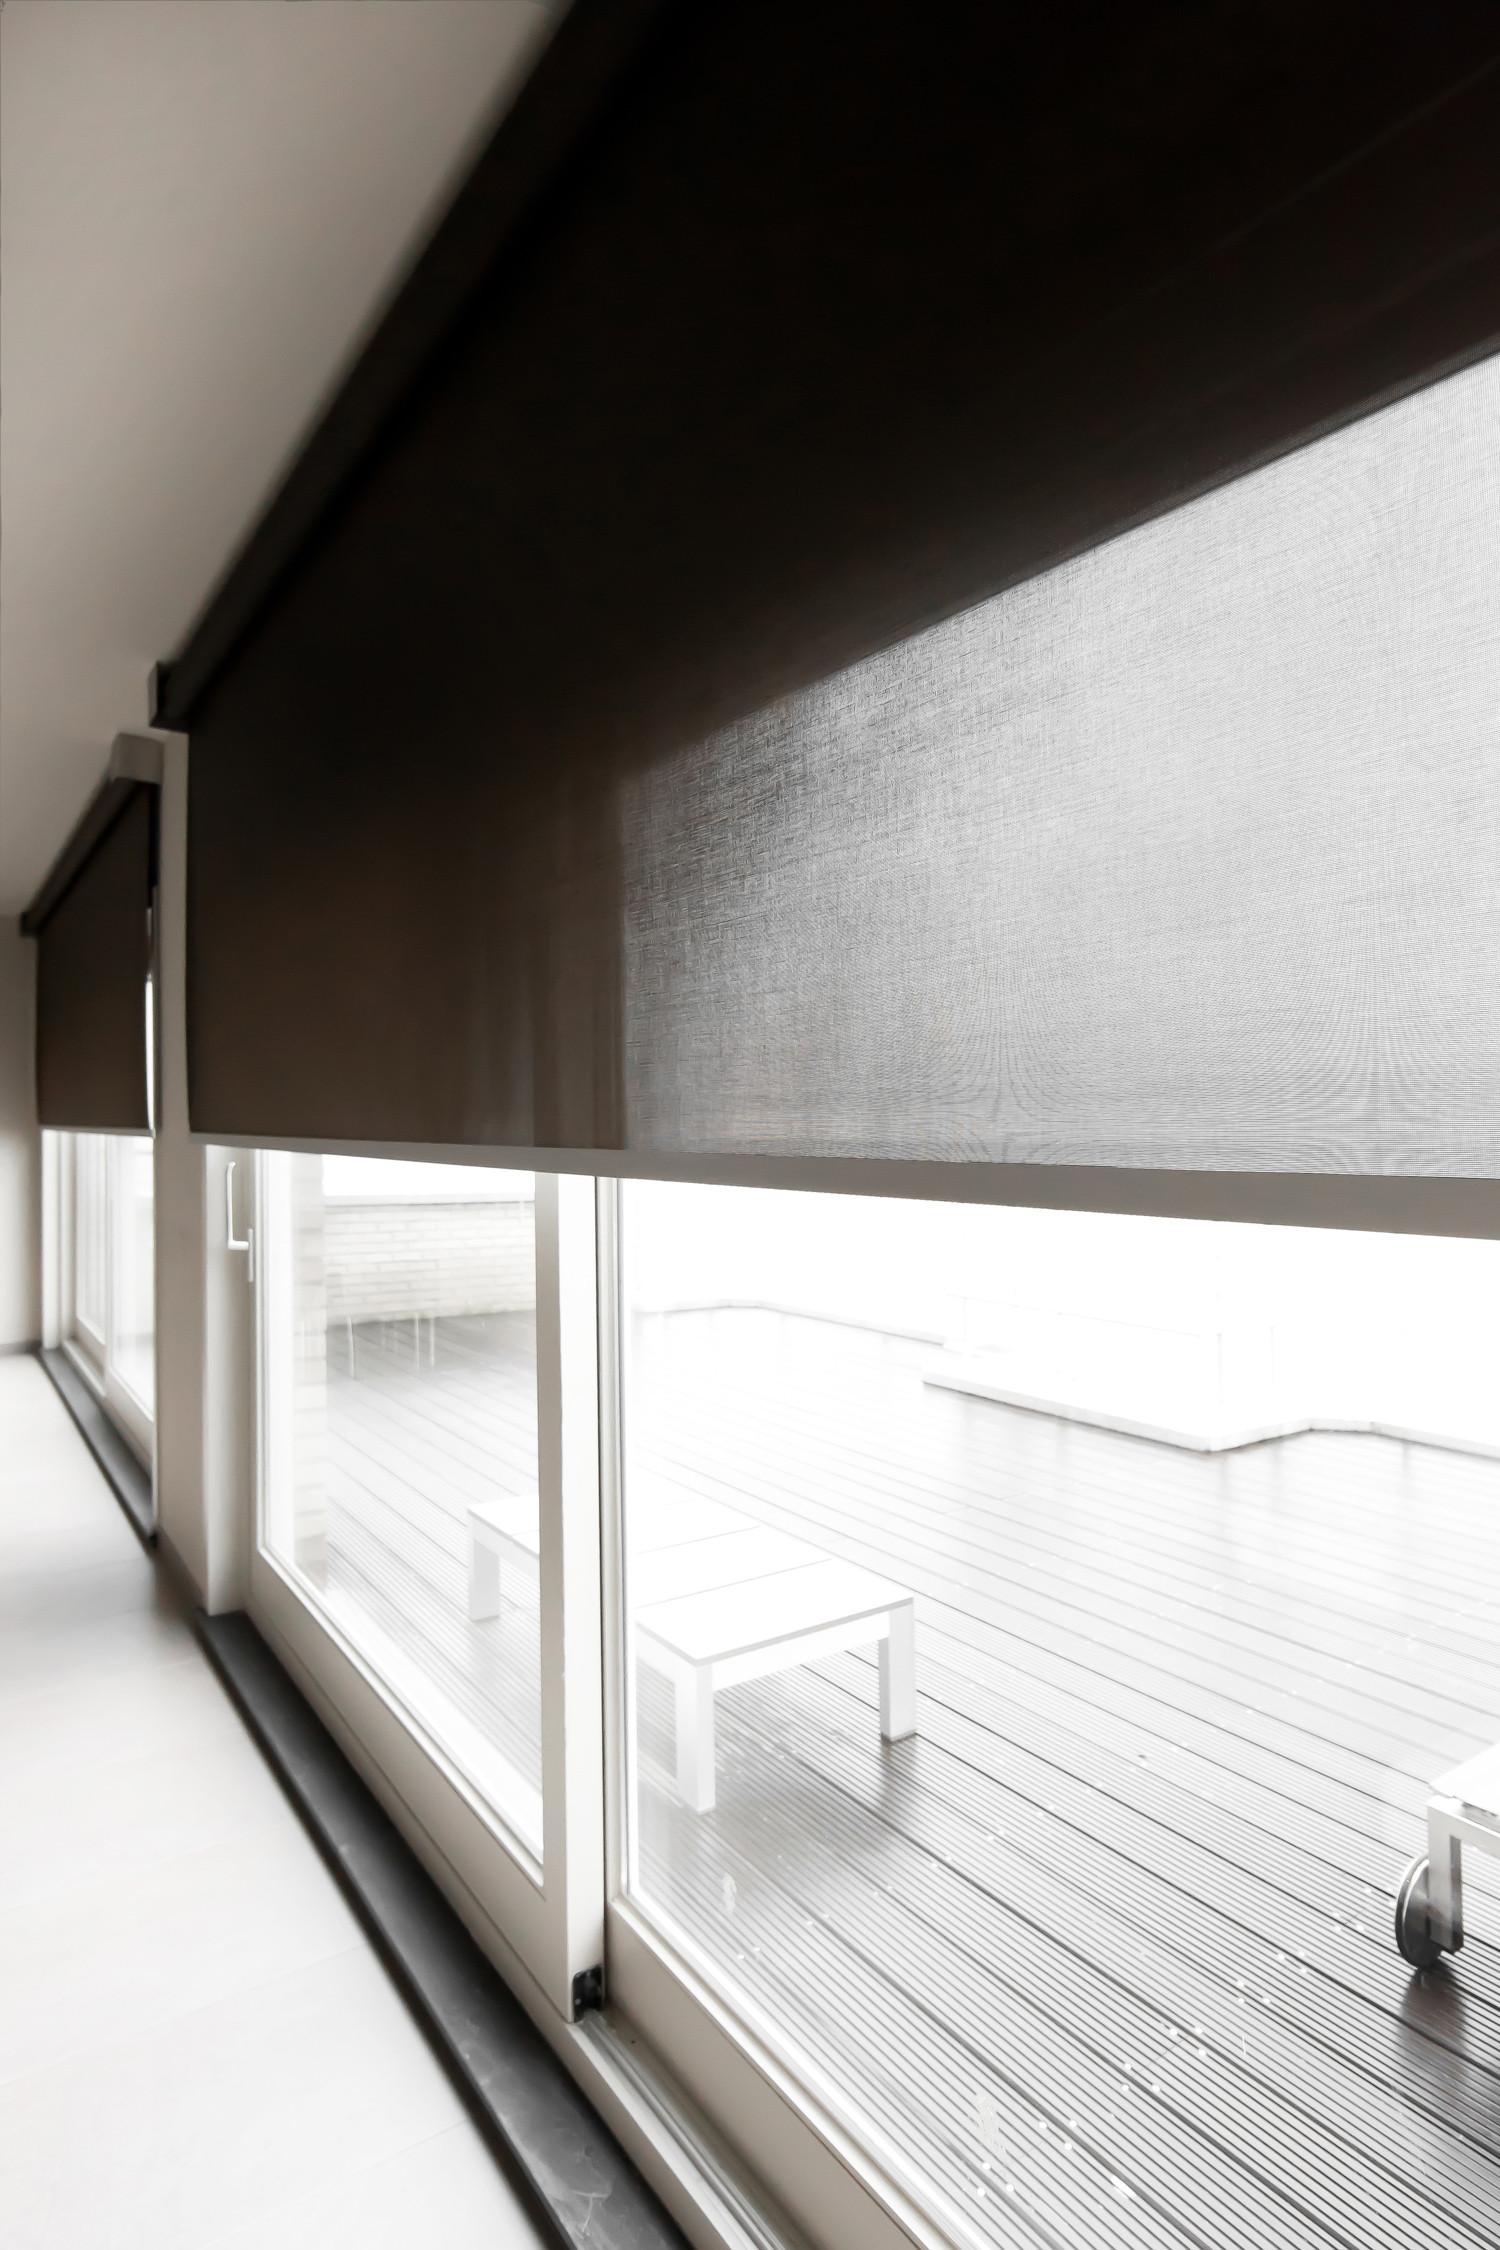 Rolxx_Ref_19.jpg Rolgordijnen Interieur Rolxx